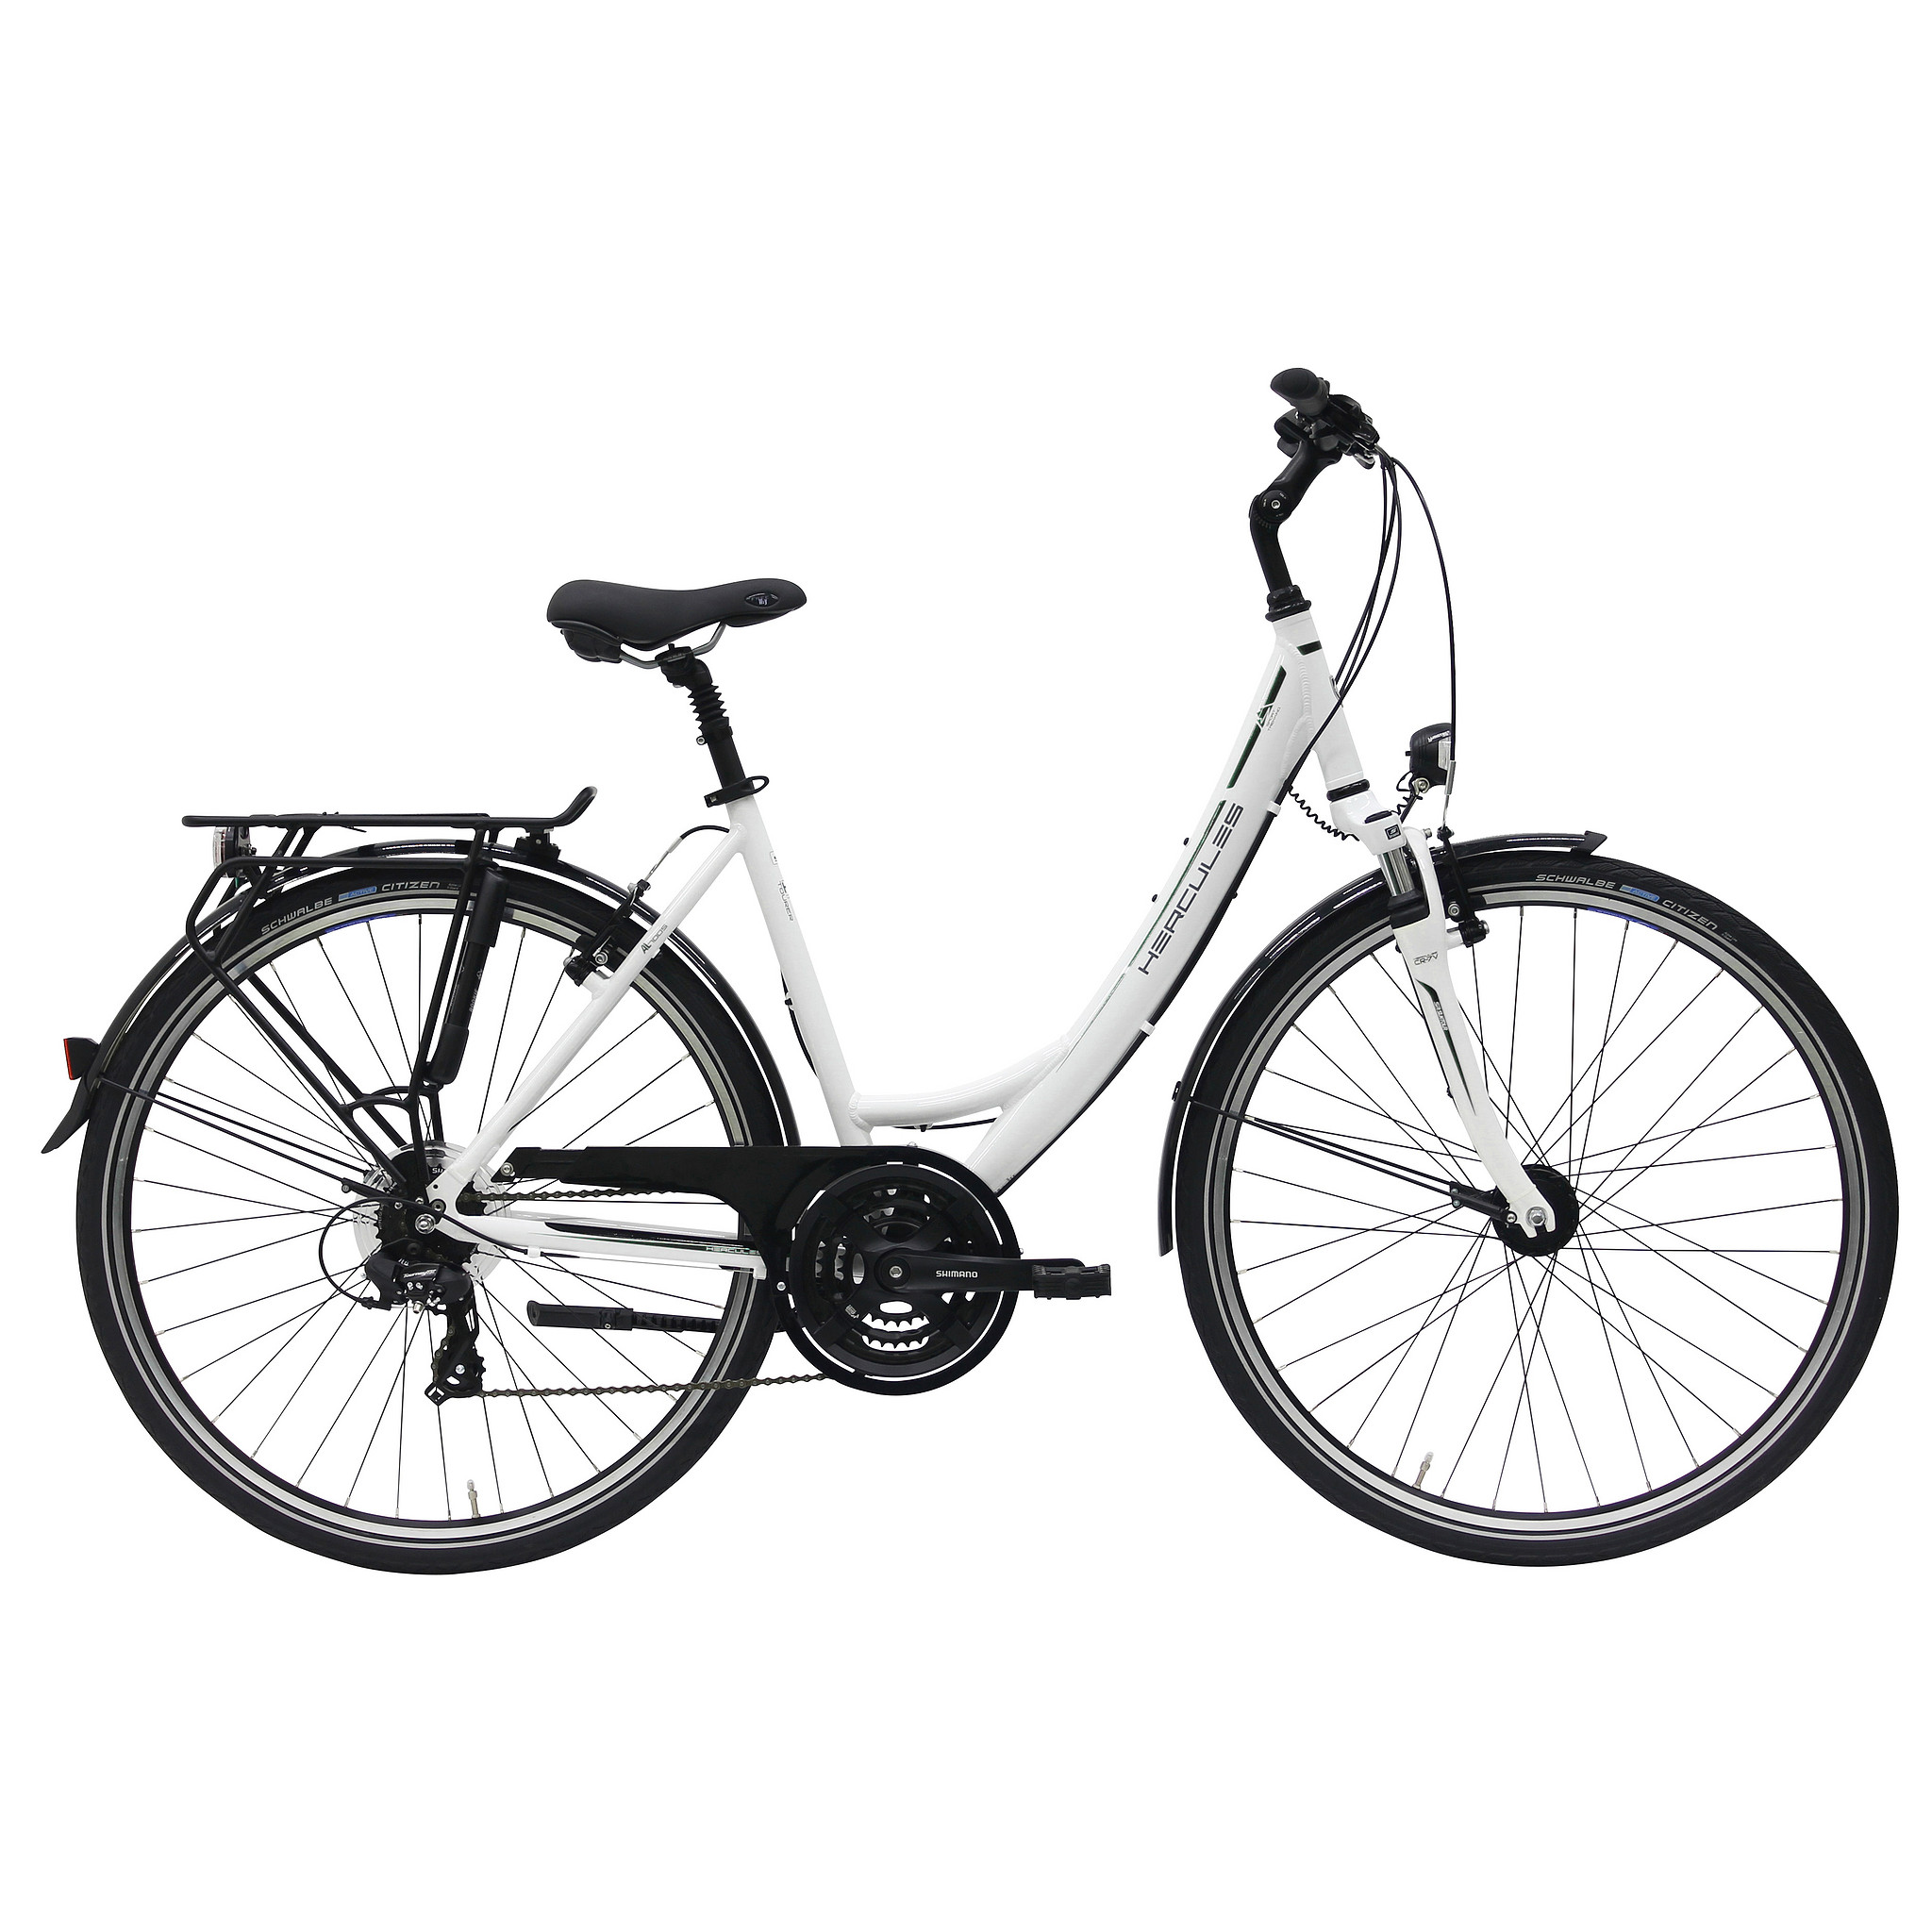 Hercules Sportieve fiets Tourer 21 dames wit 45cm Wit